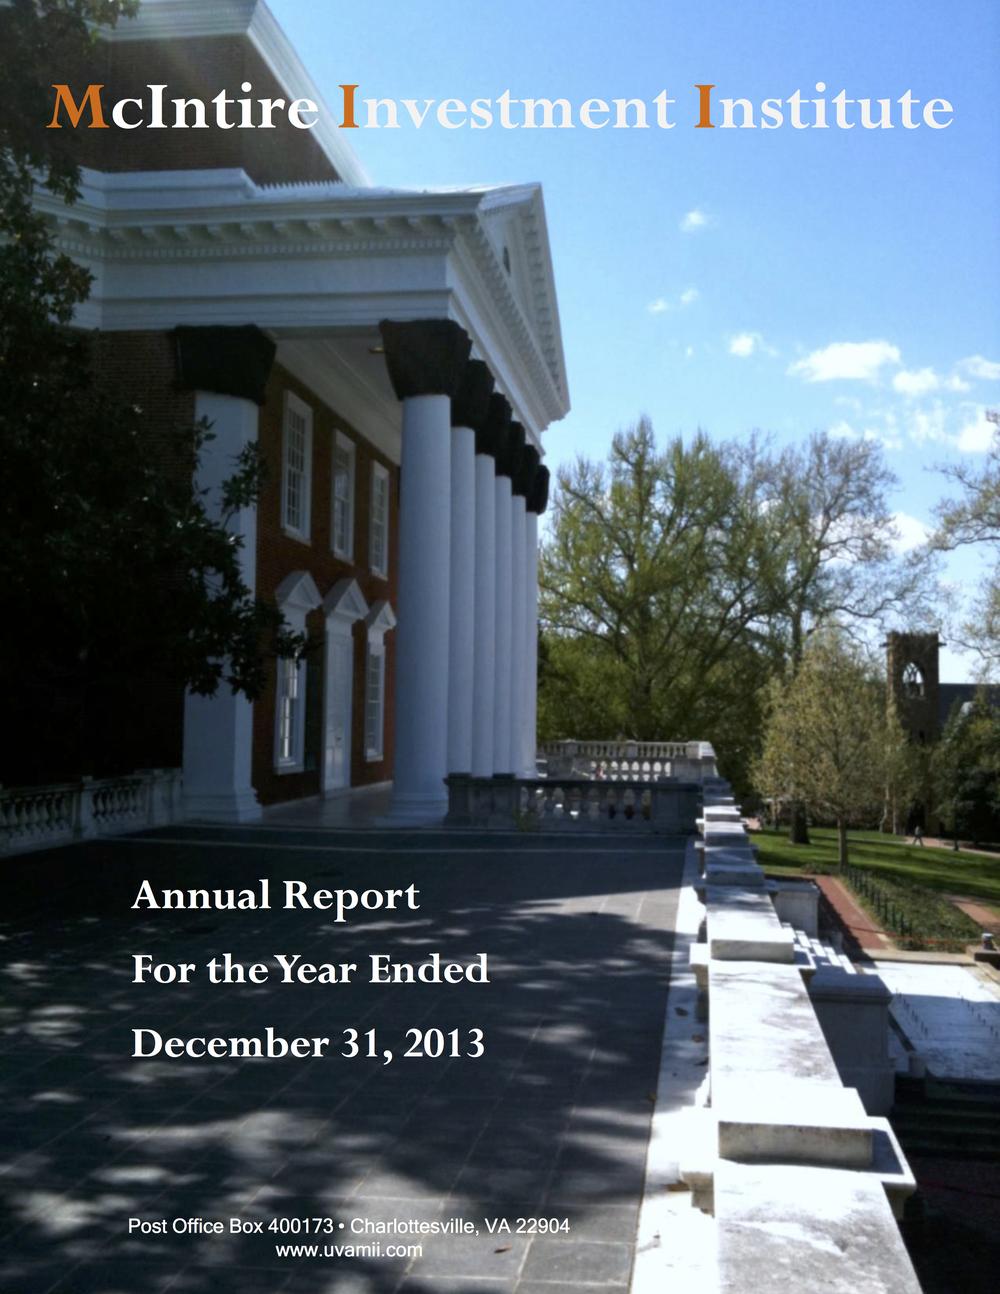 ANNUAL REPORT DECEMBER 2013